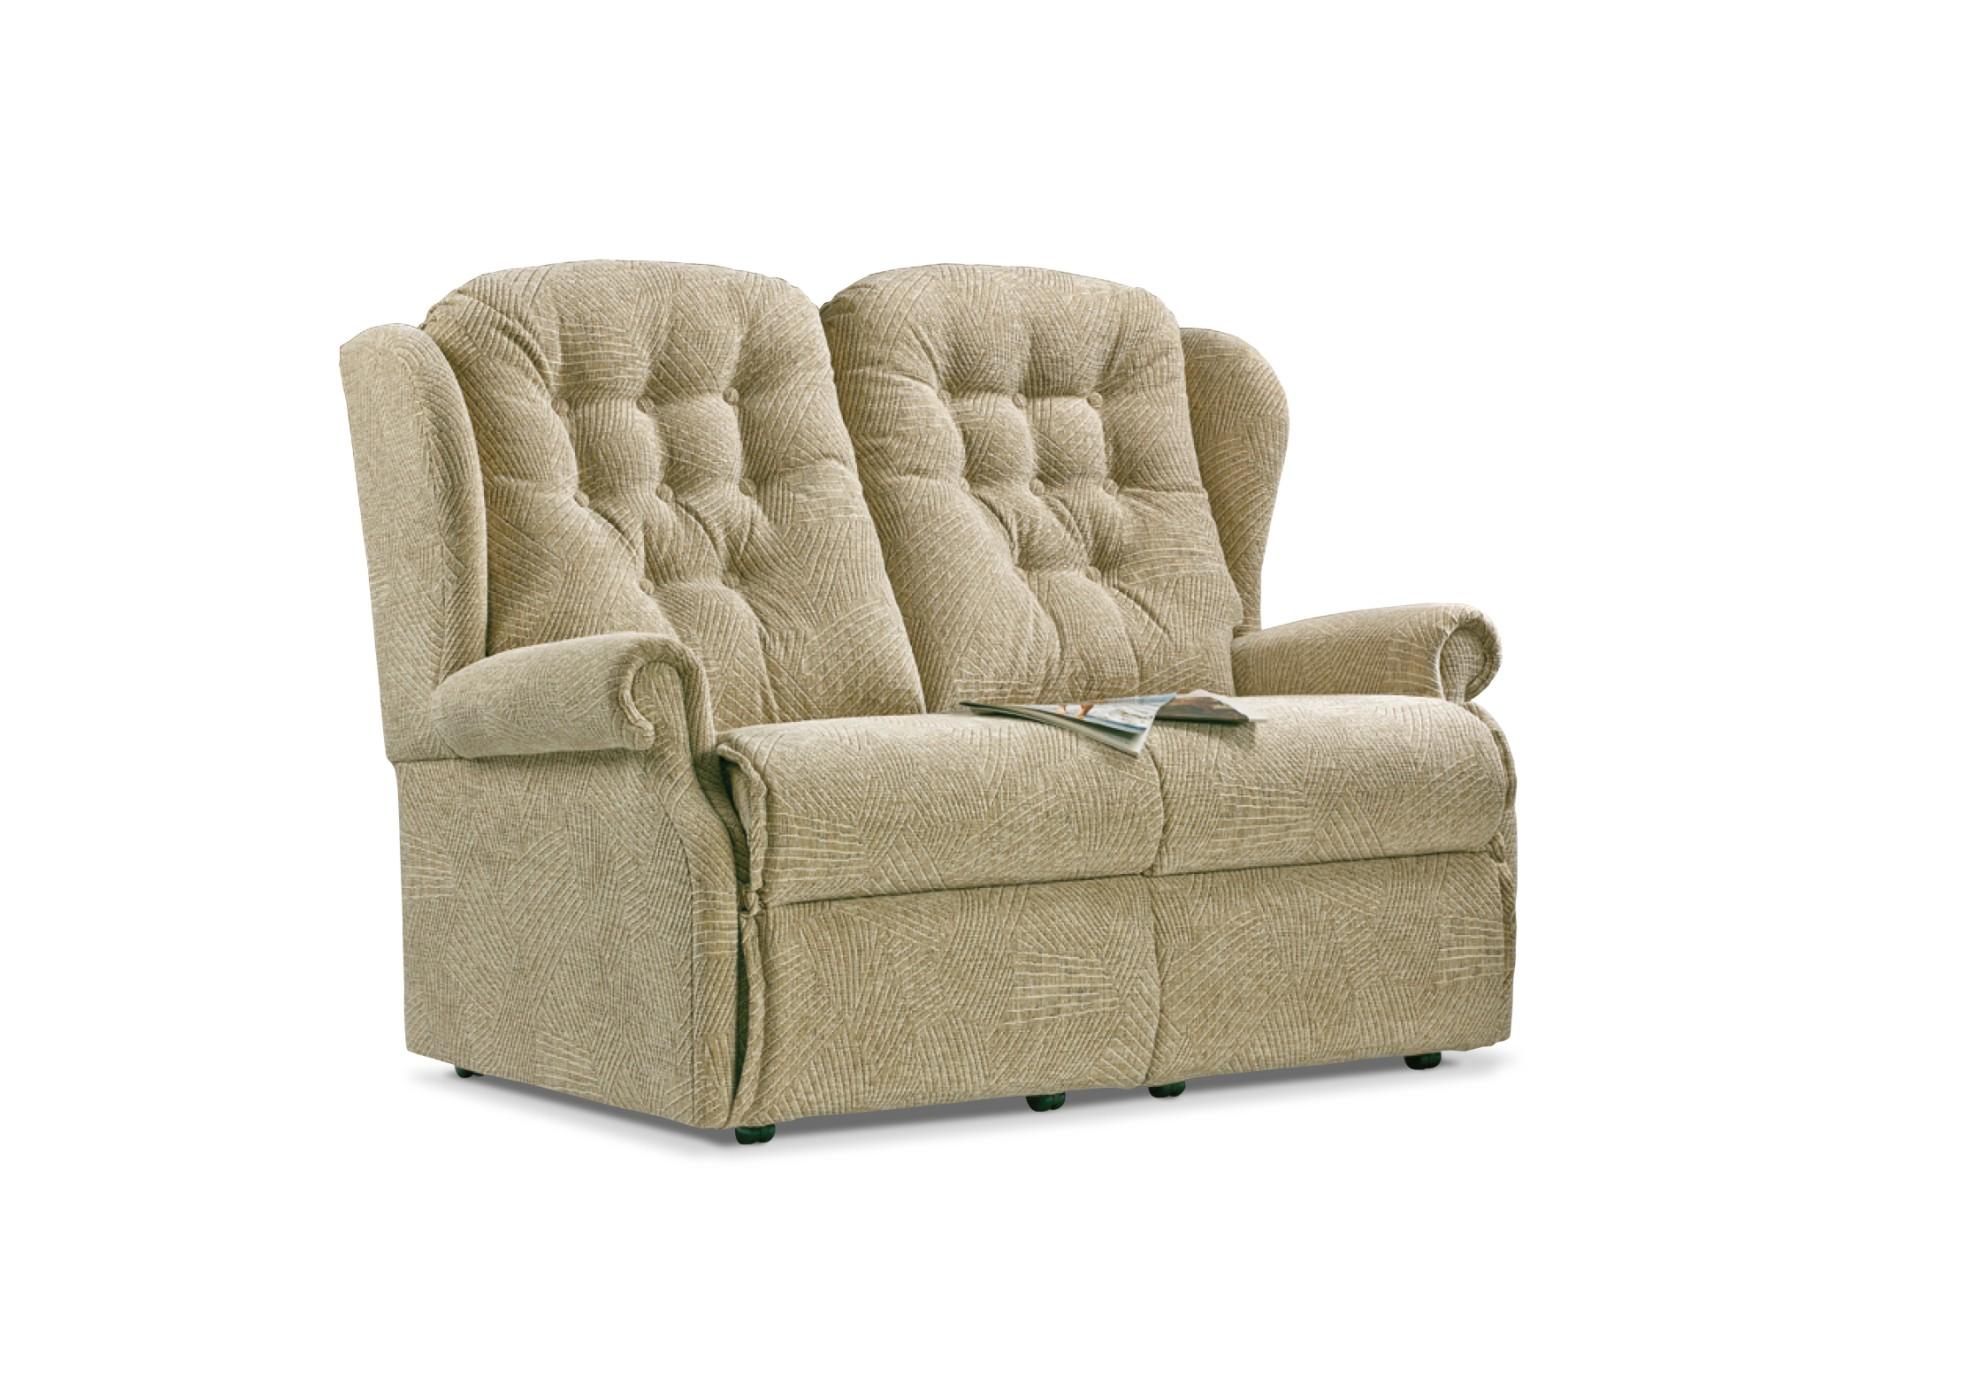 Lynton 2 Seater Sofa